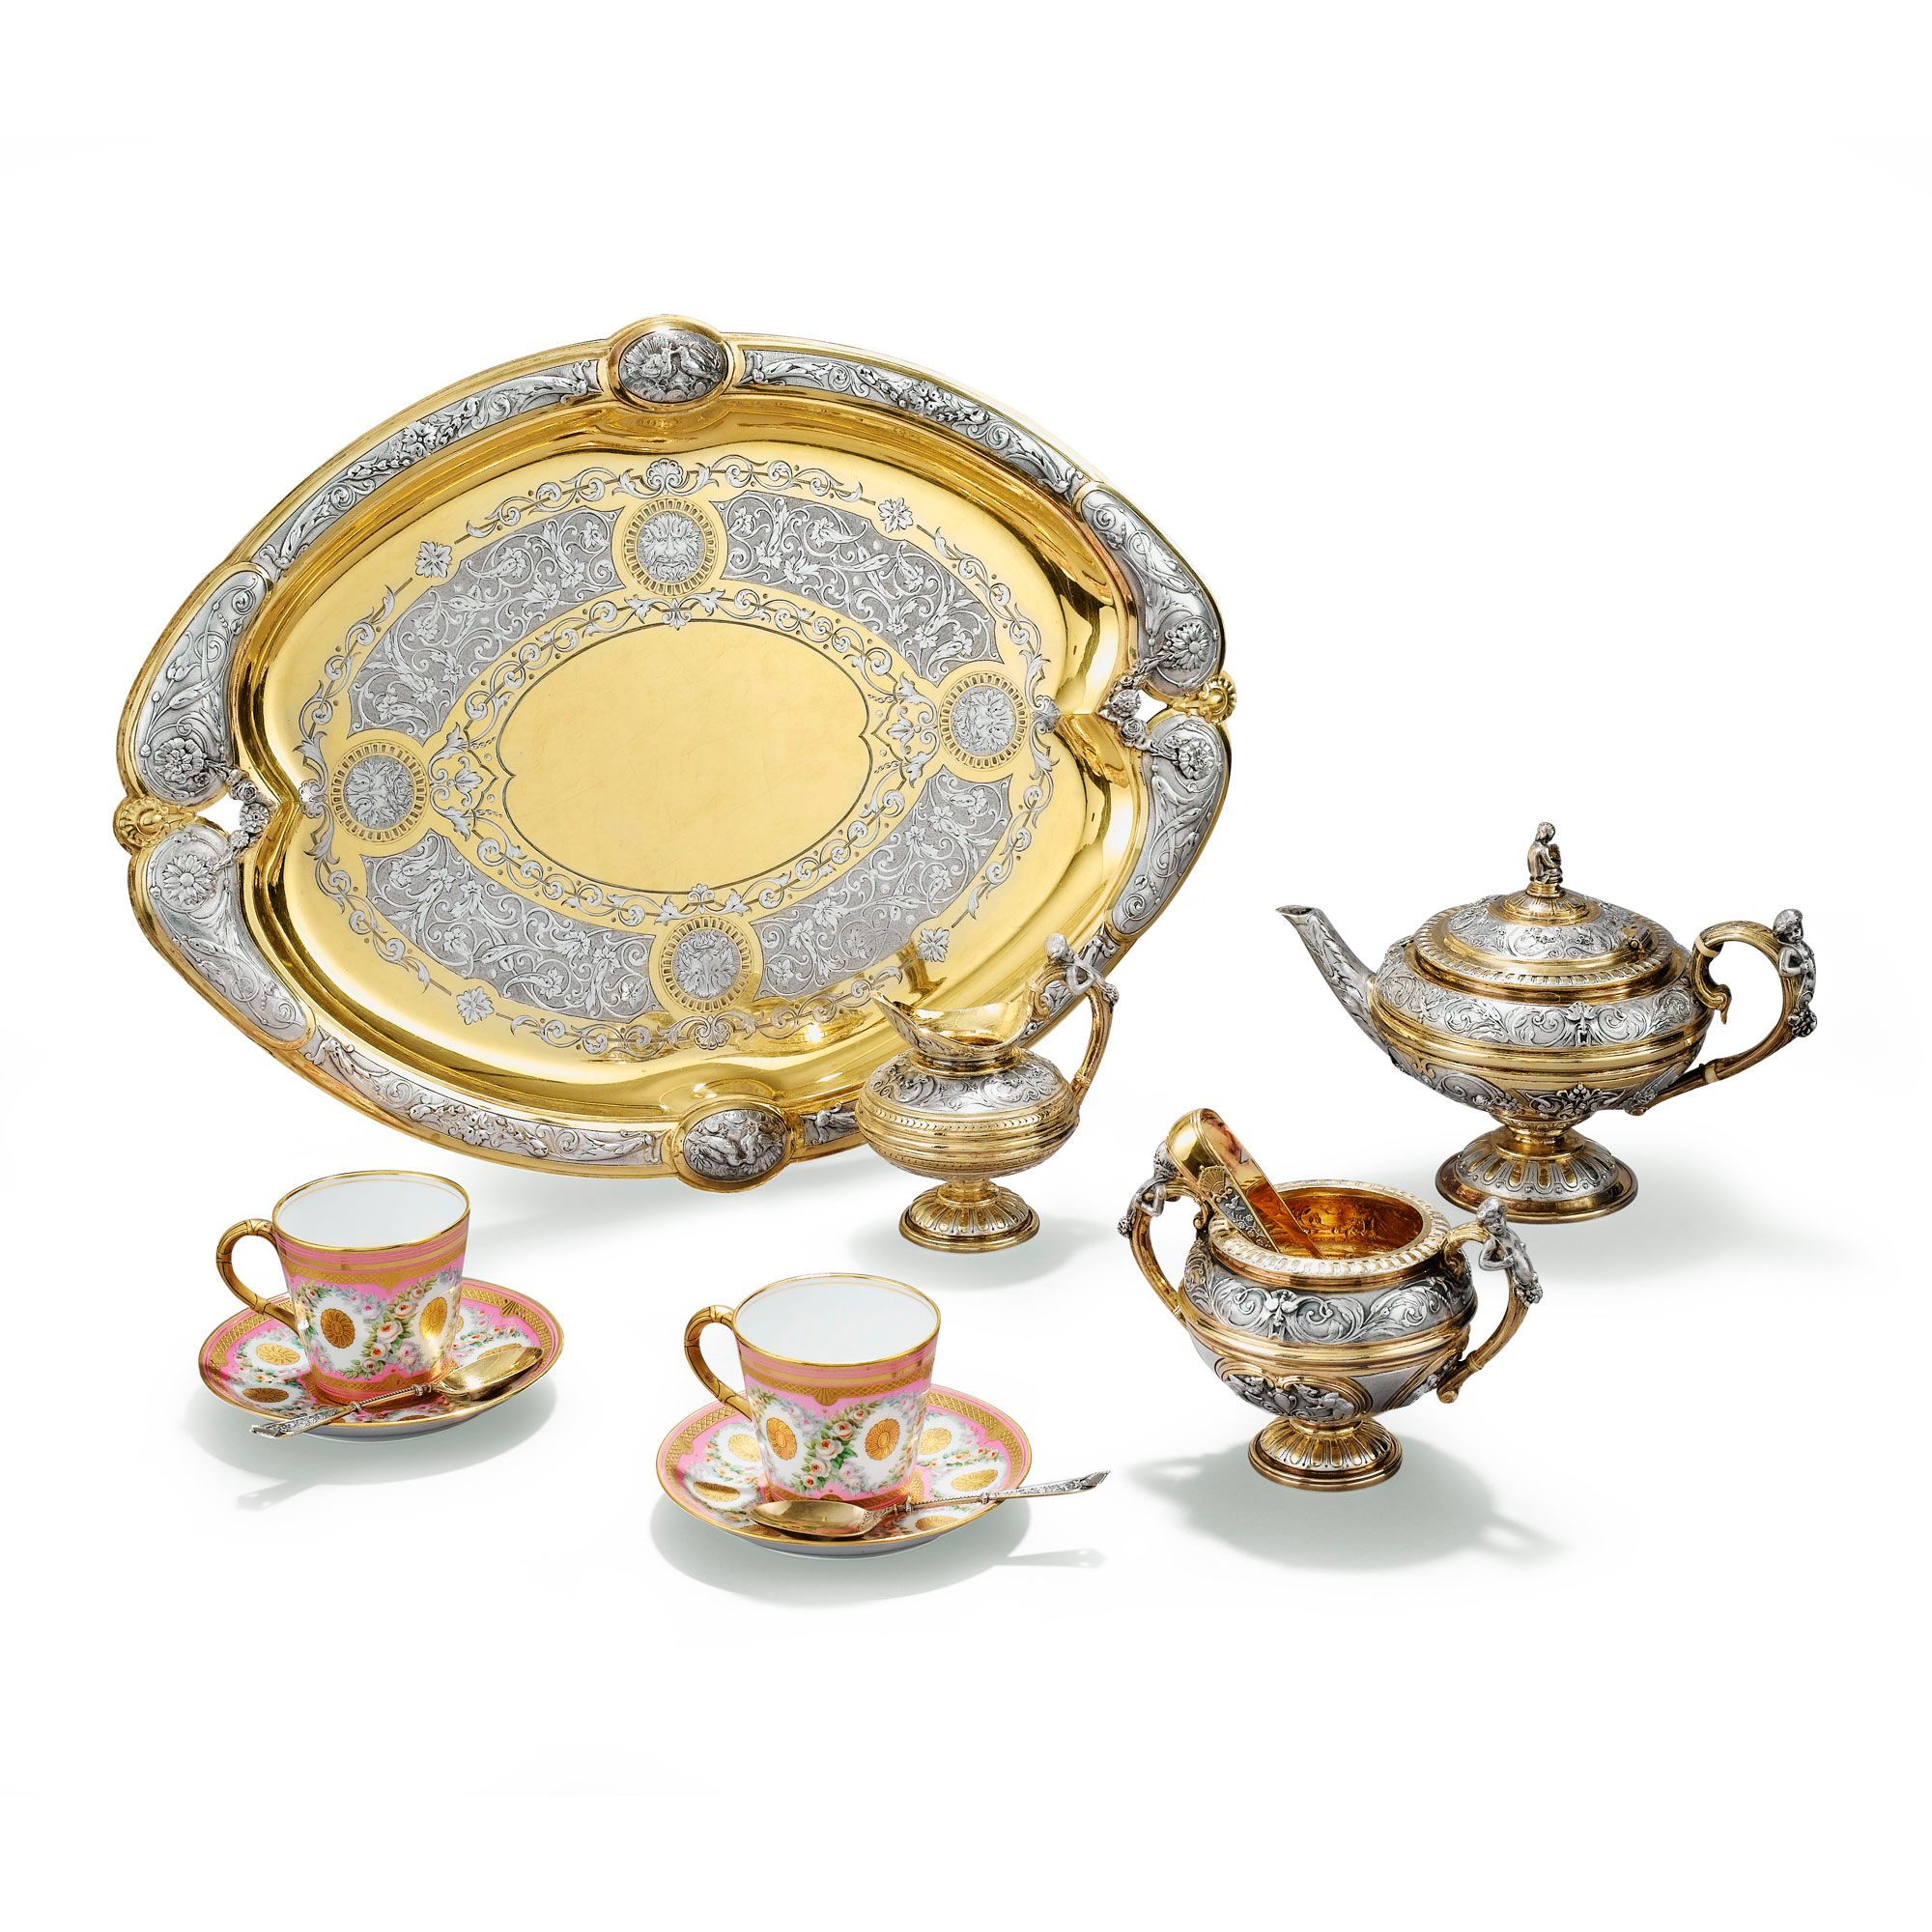 AN ENGLISH GOLD AND SILVER-PLATED BACHELOR'S TEA SET, ELKINGTON, BIRMINGHAM, CIRCA 1880